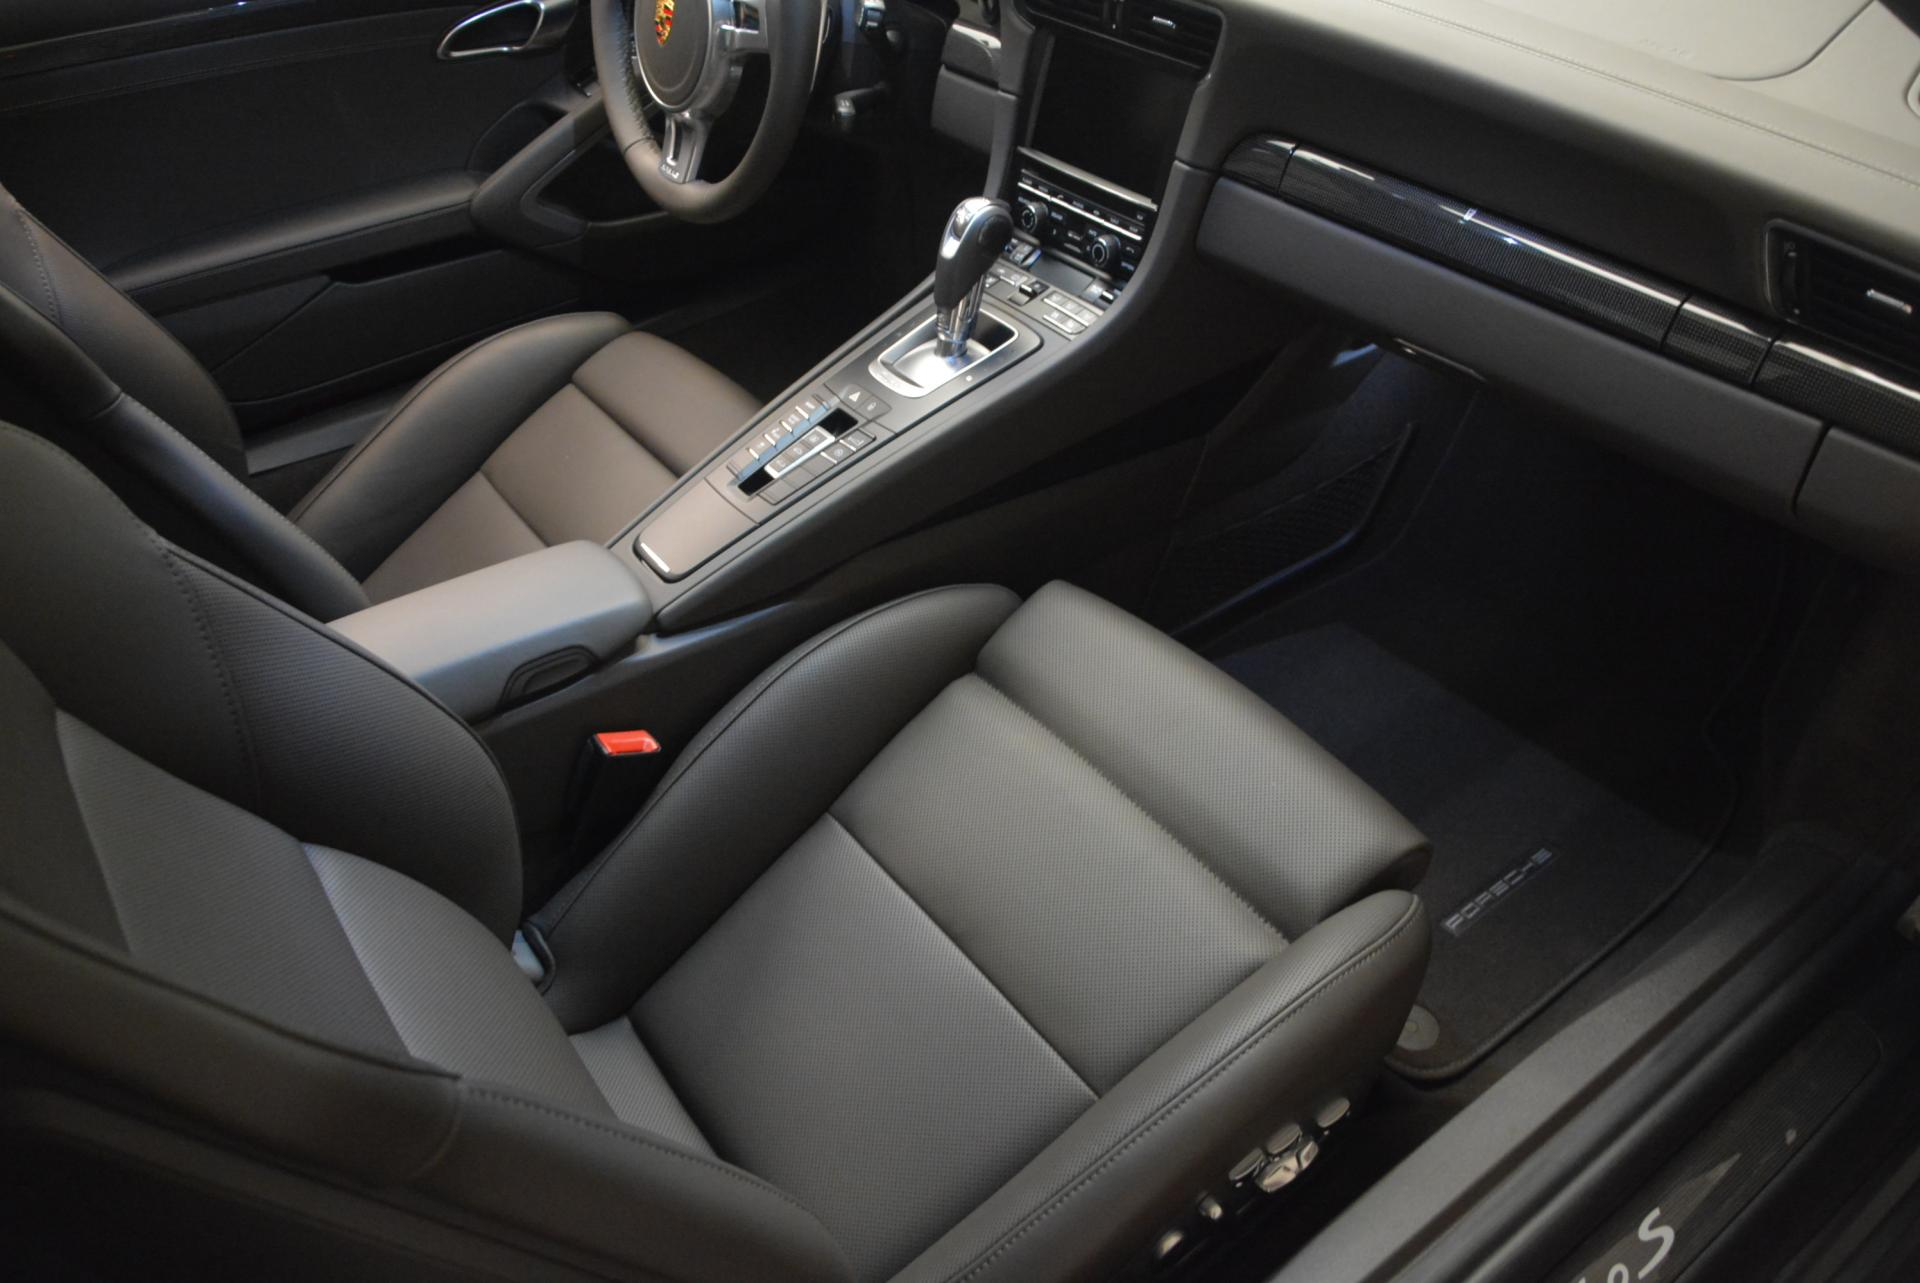 Used 2014 Porsche 911 Turbo S For Sale In Greenwich, CT 113_p19